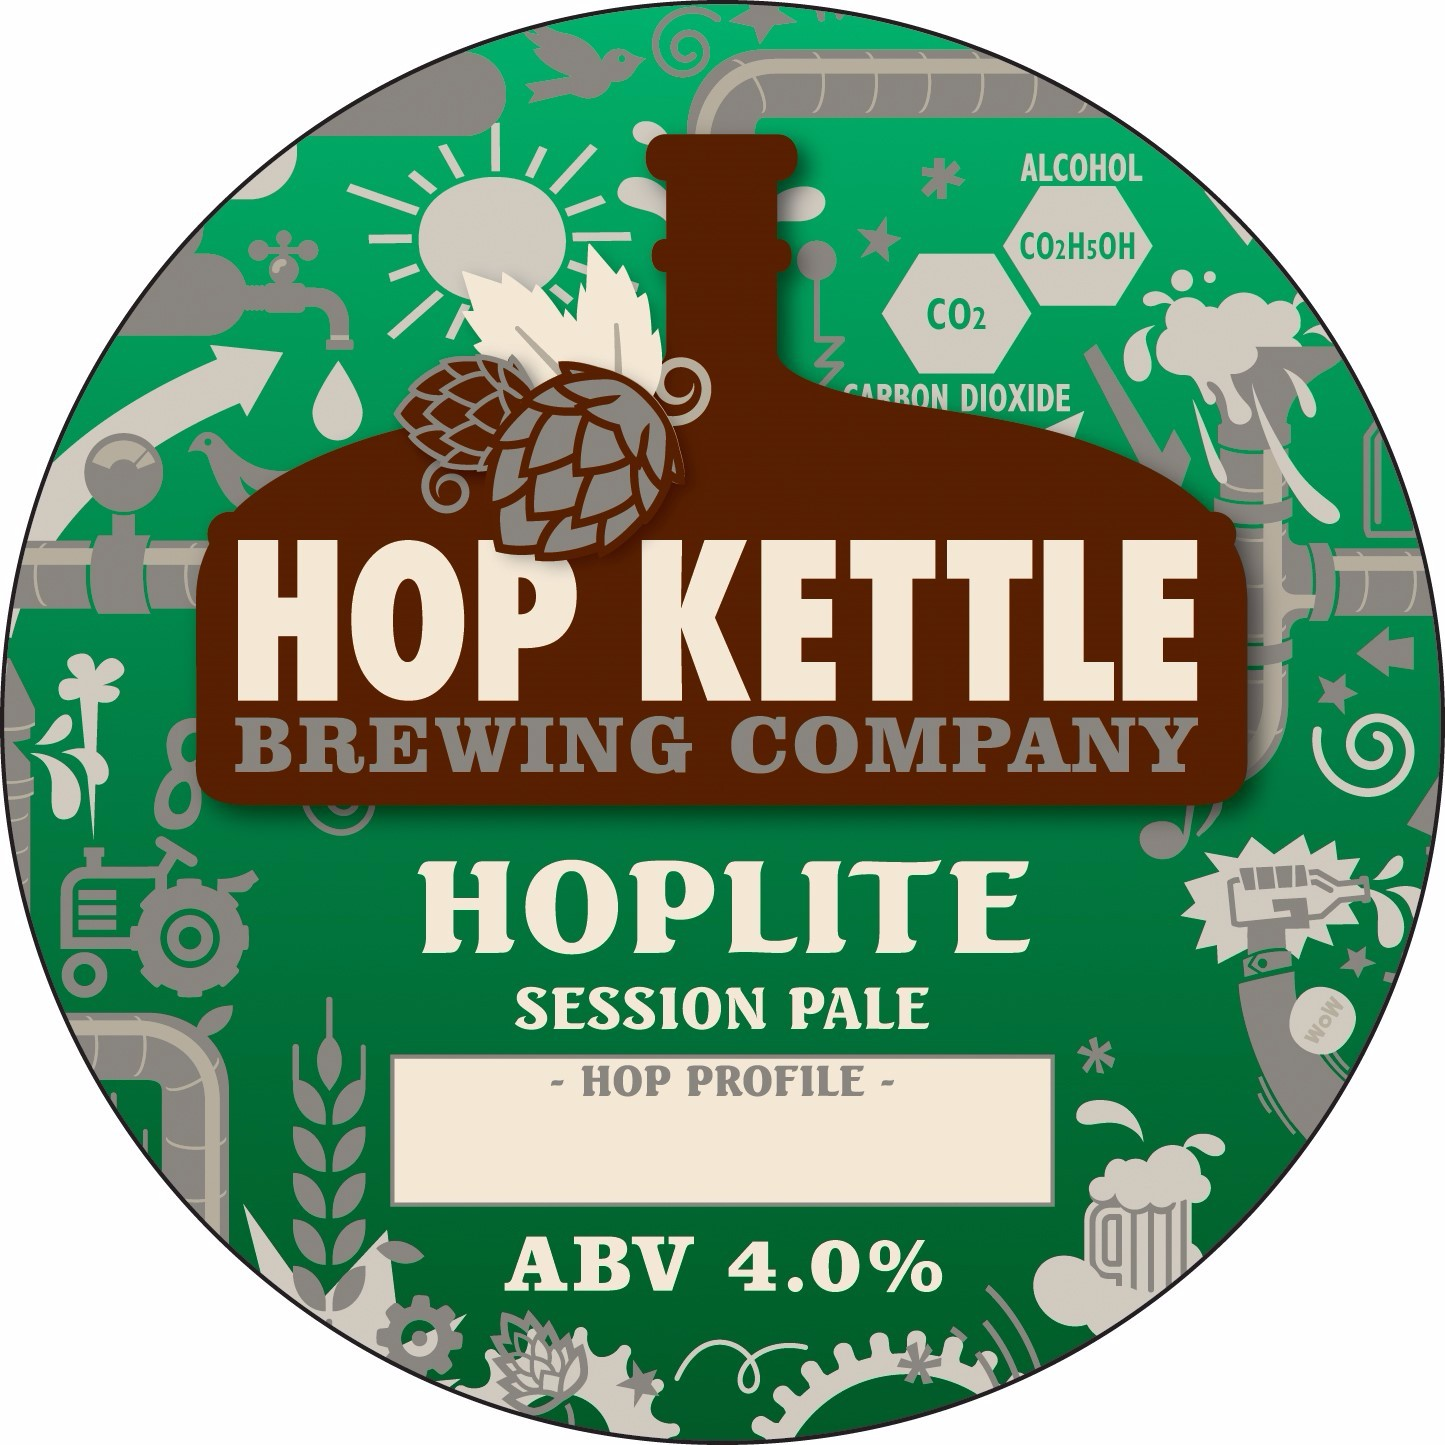 Hop Kettle Hoplite